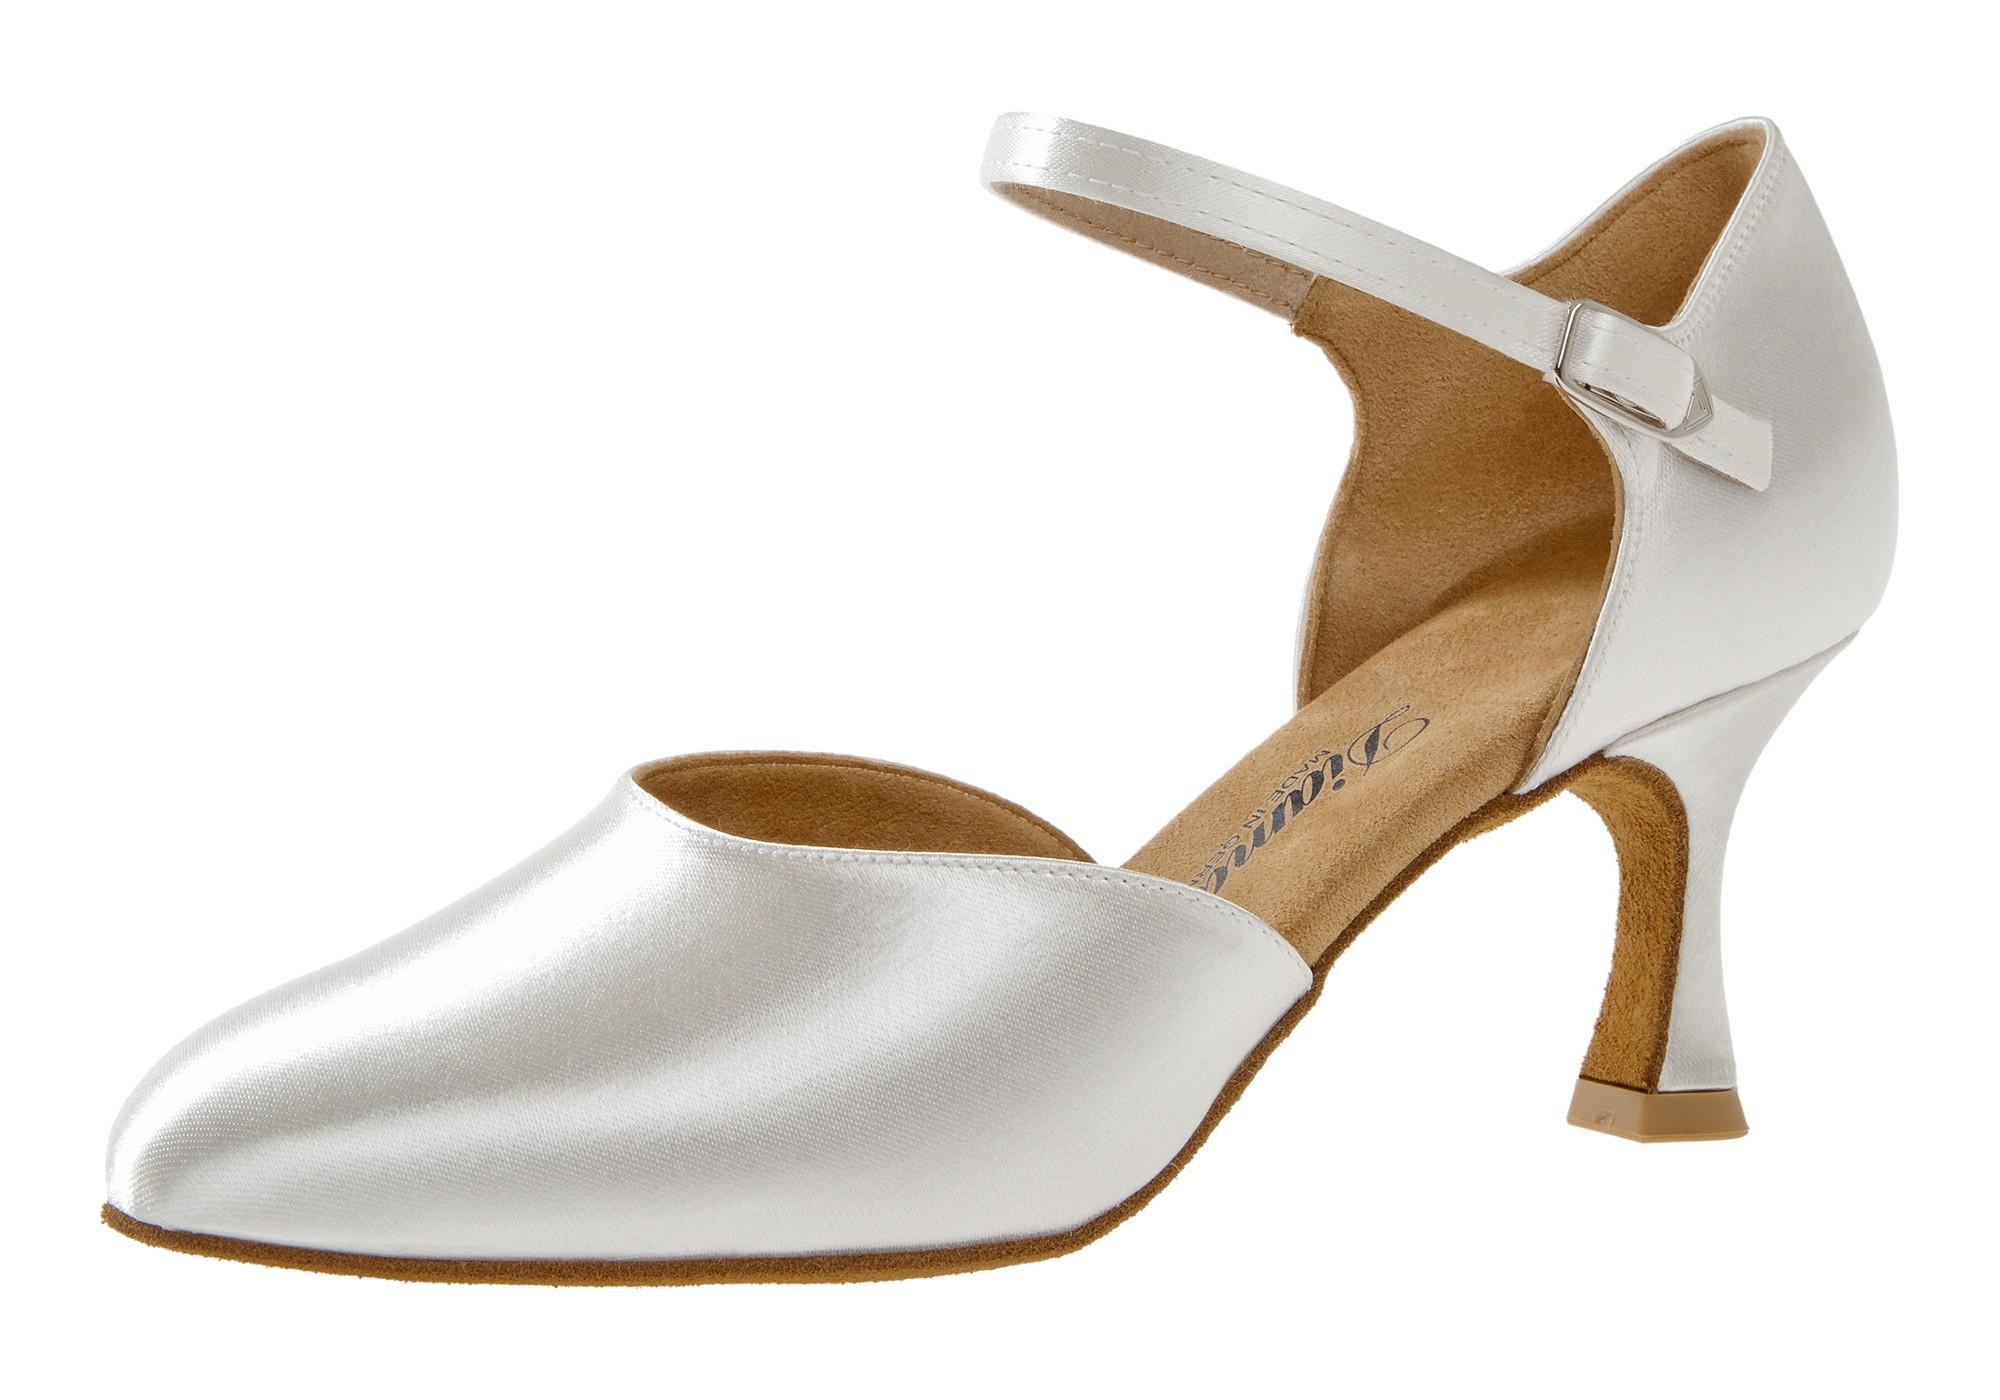 Diamant Damen Tanzschuh Standard 051-085-092 weiß Satin